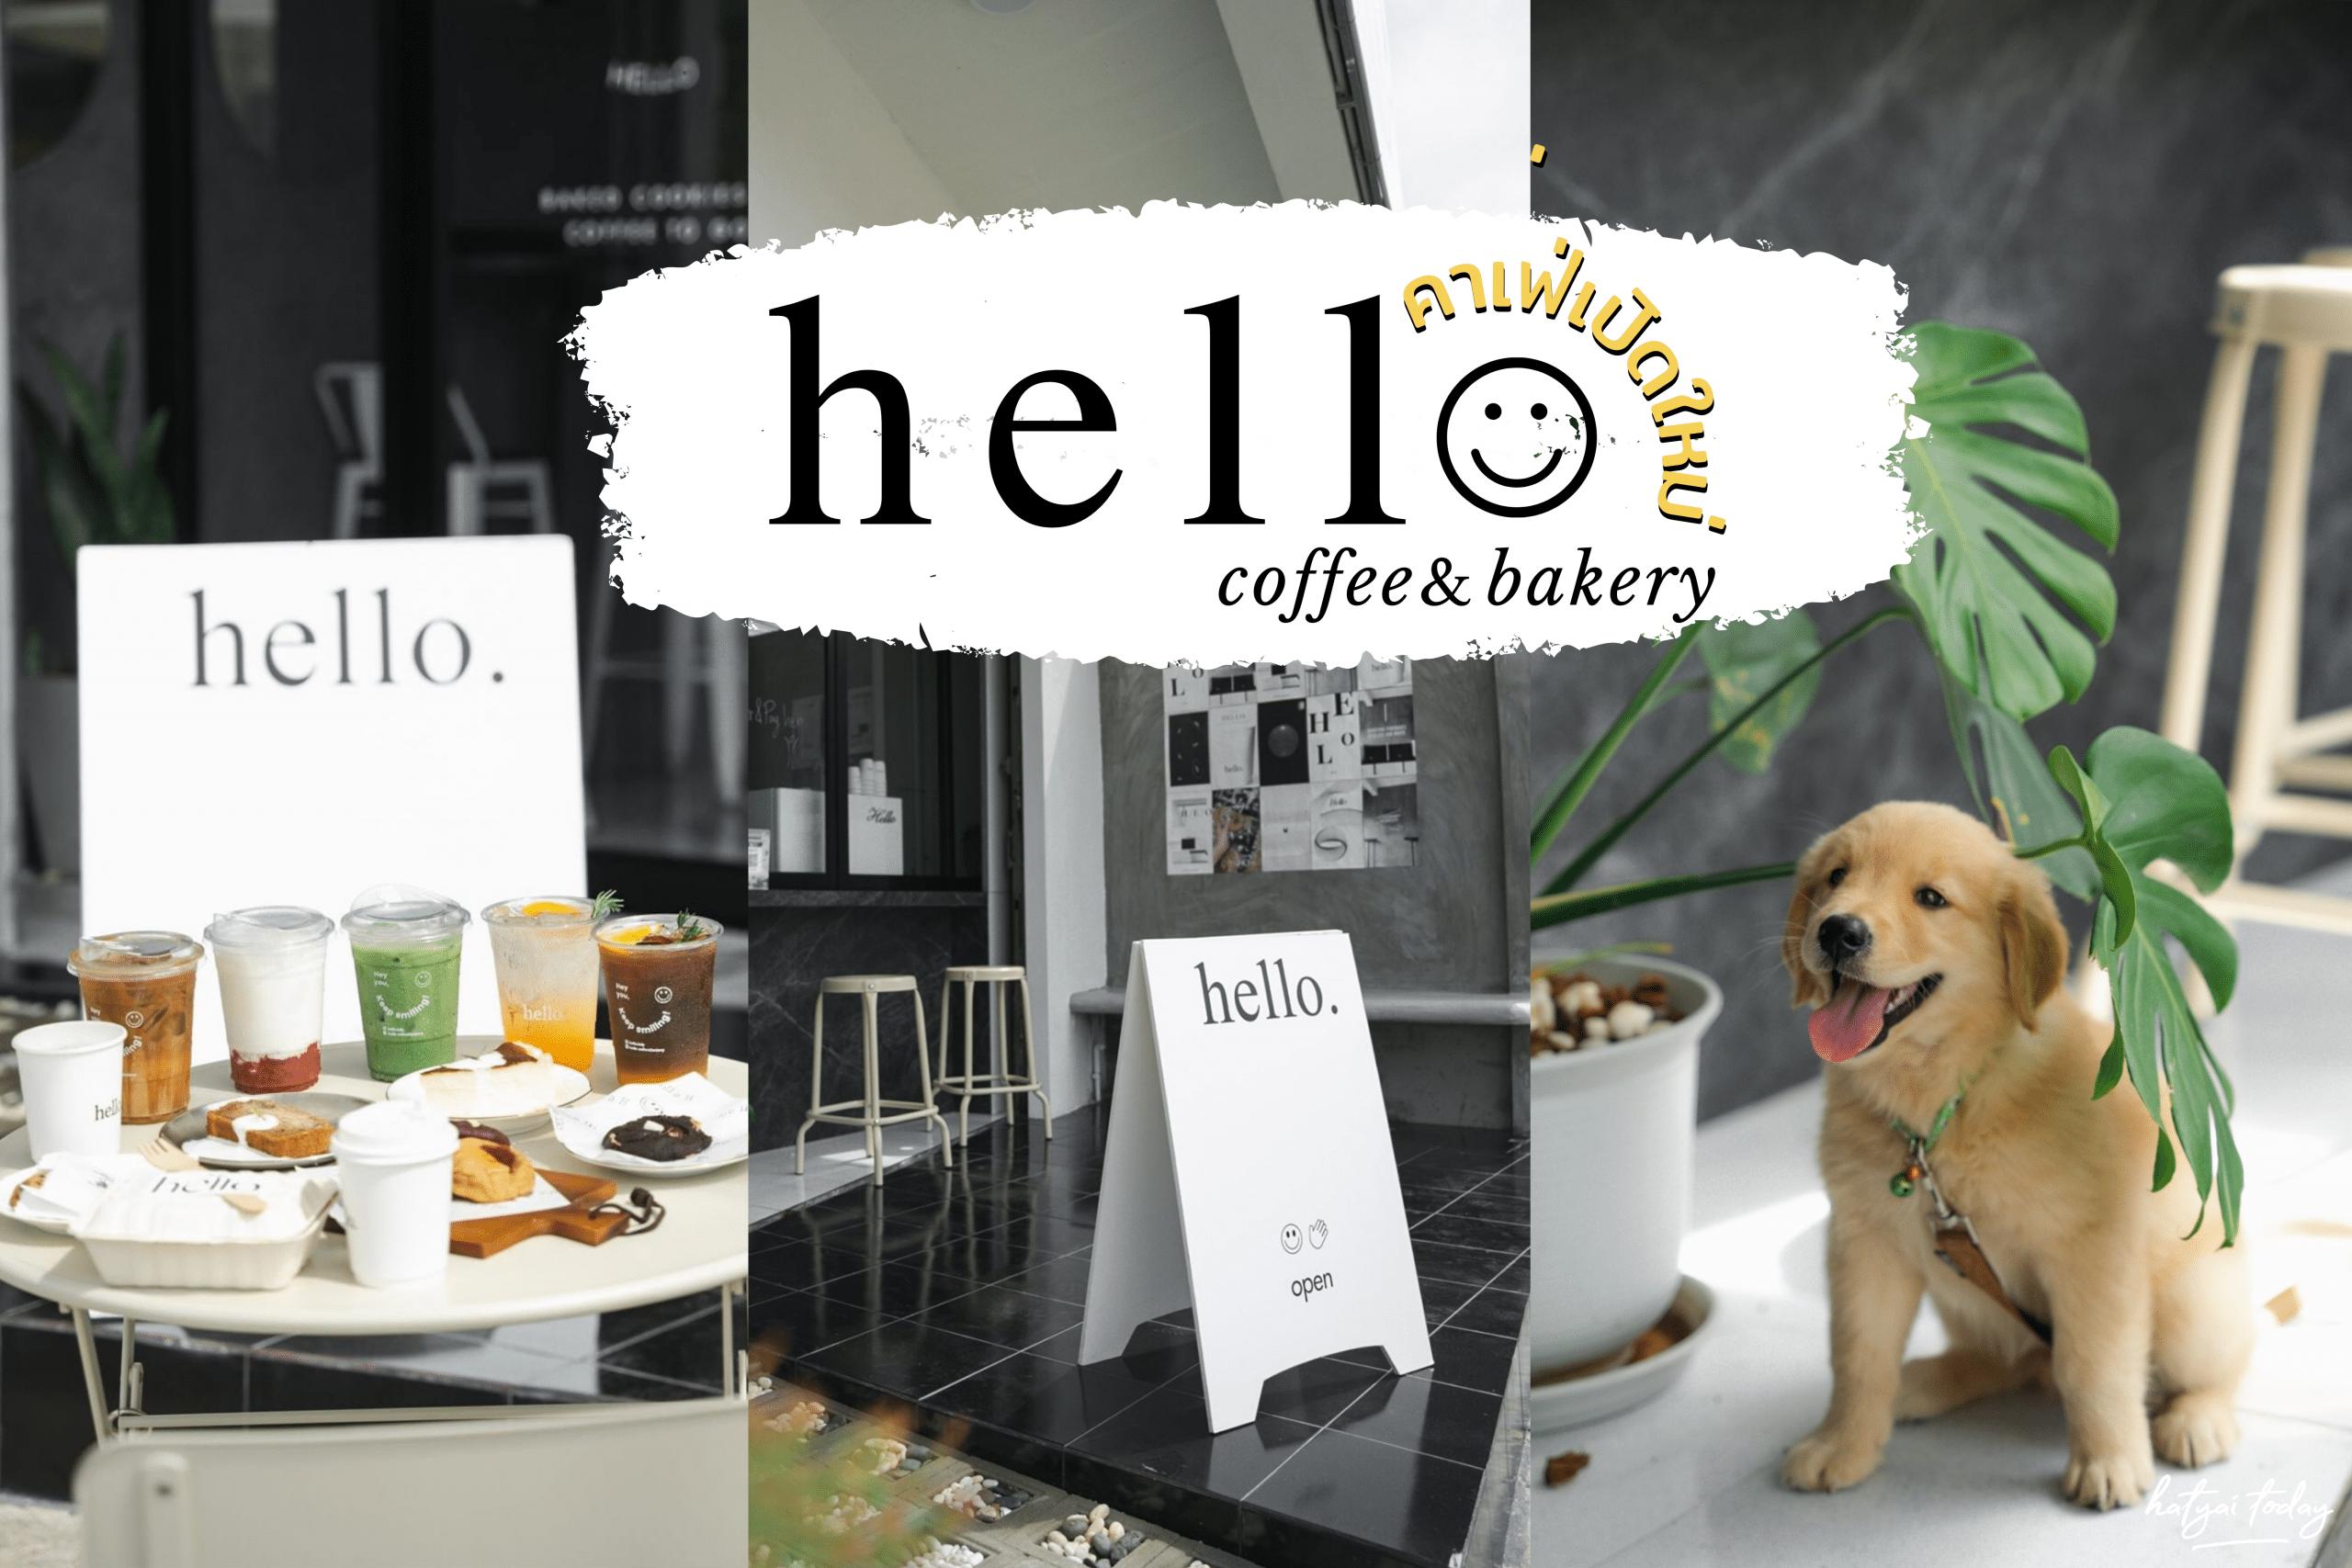 Hello coffee & bakery